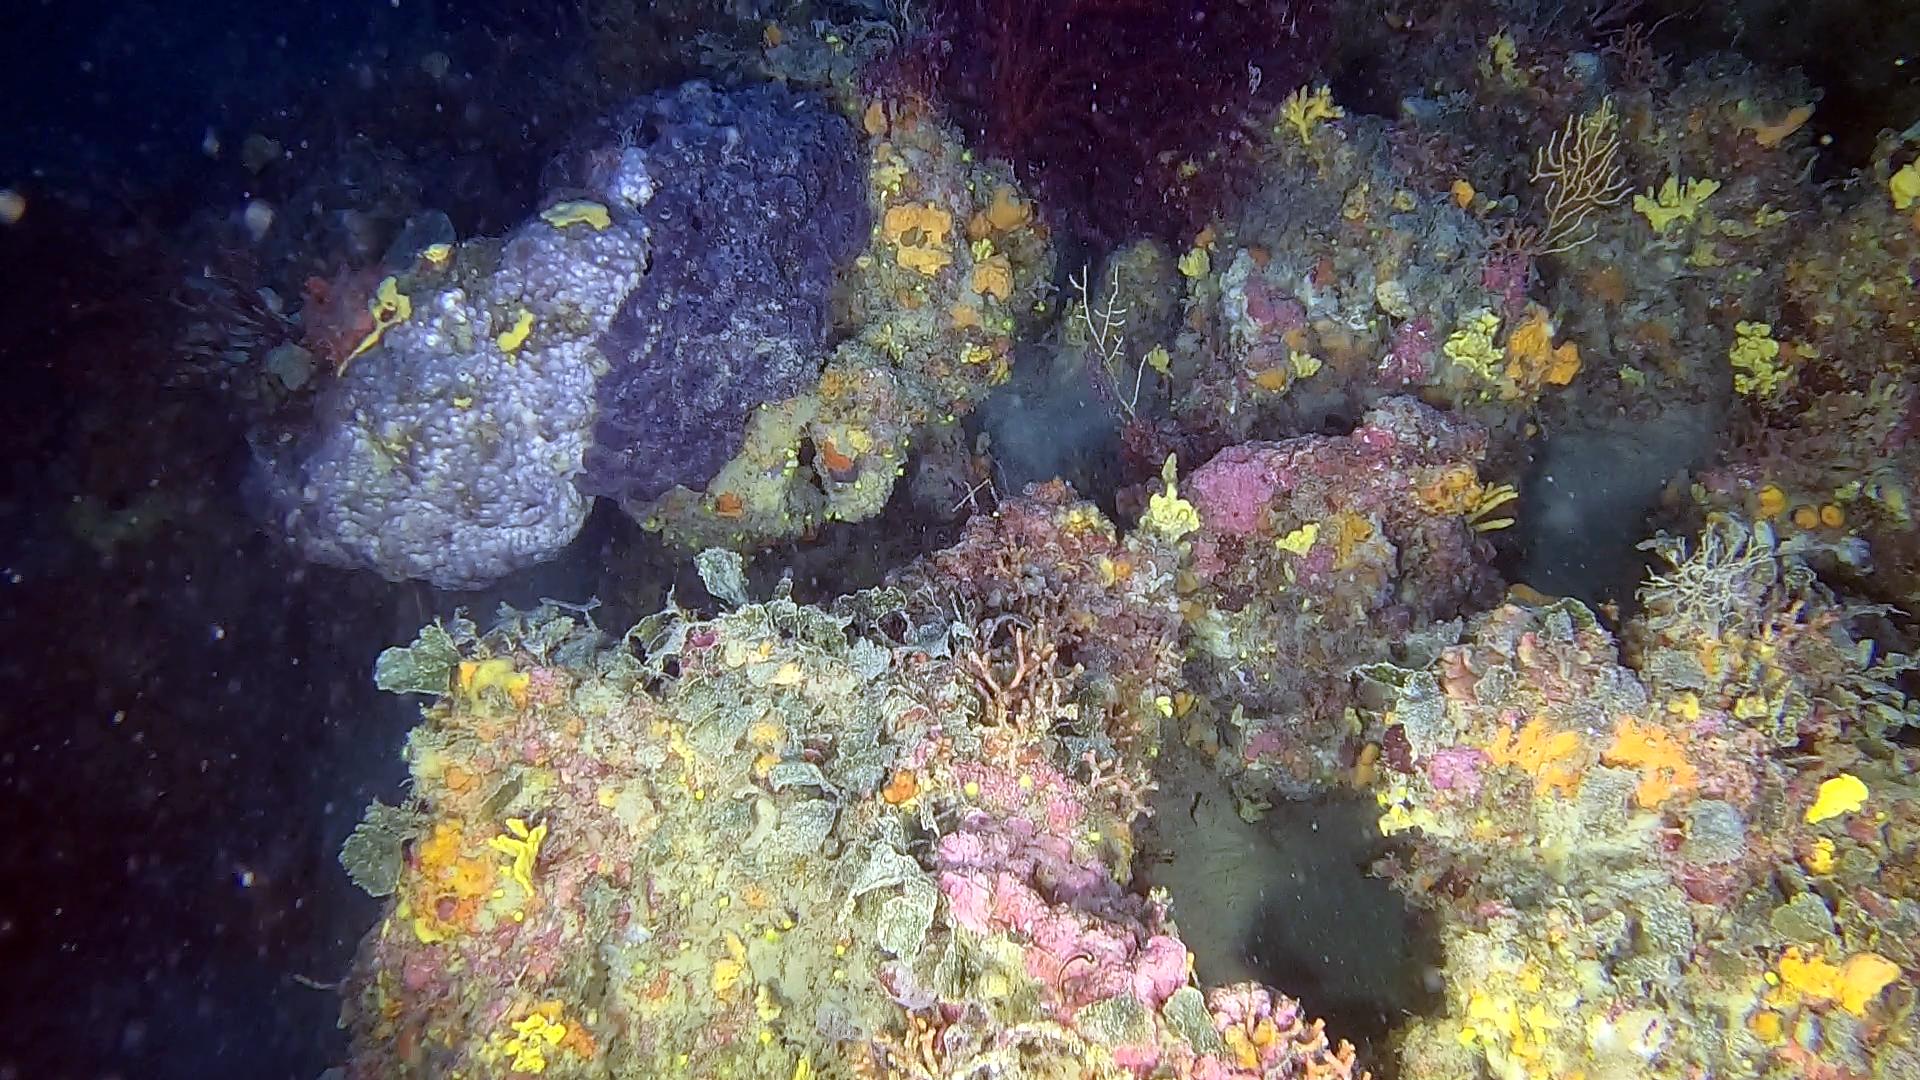 Spongia officinalis - Spugna da bagno - bath Sponge - intotheblue.it